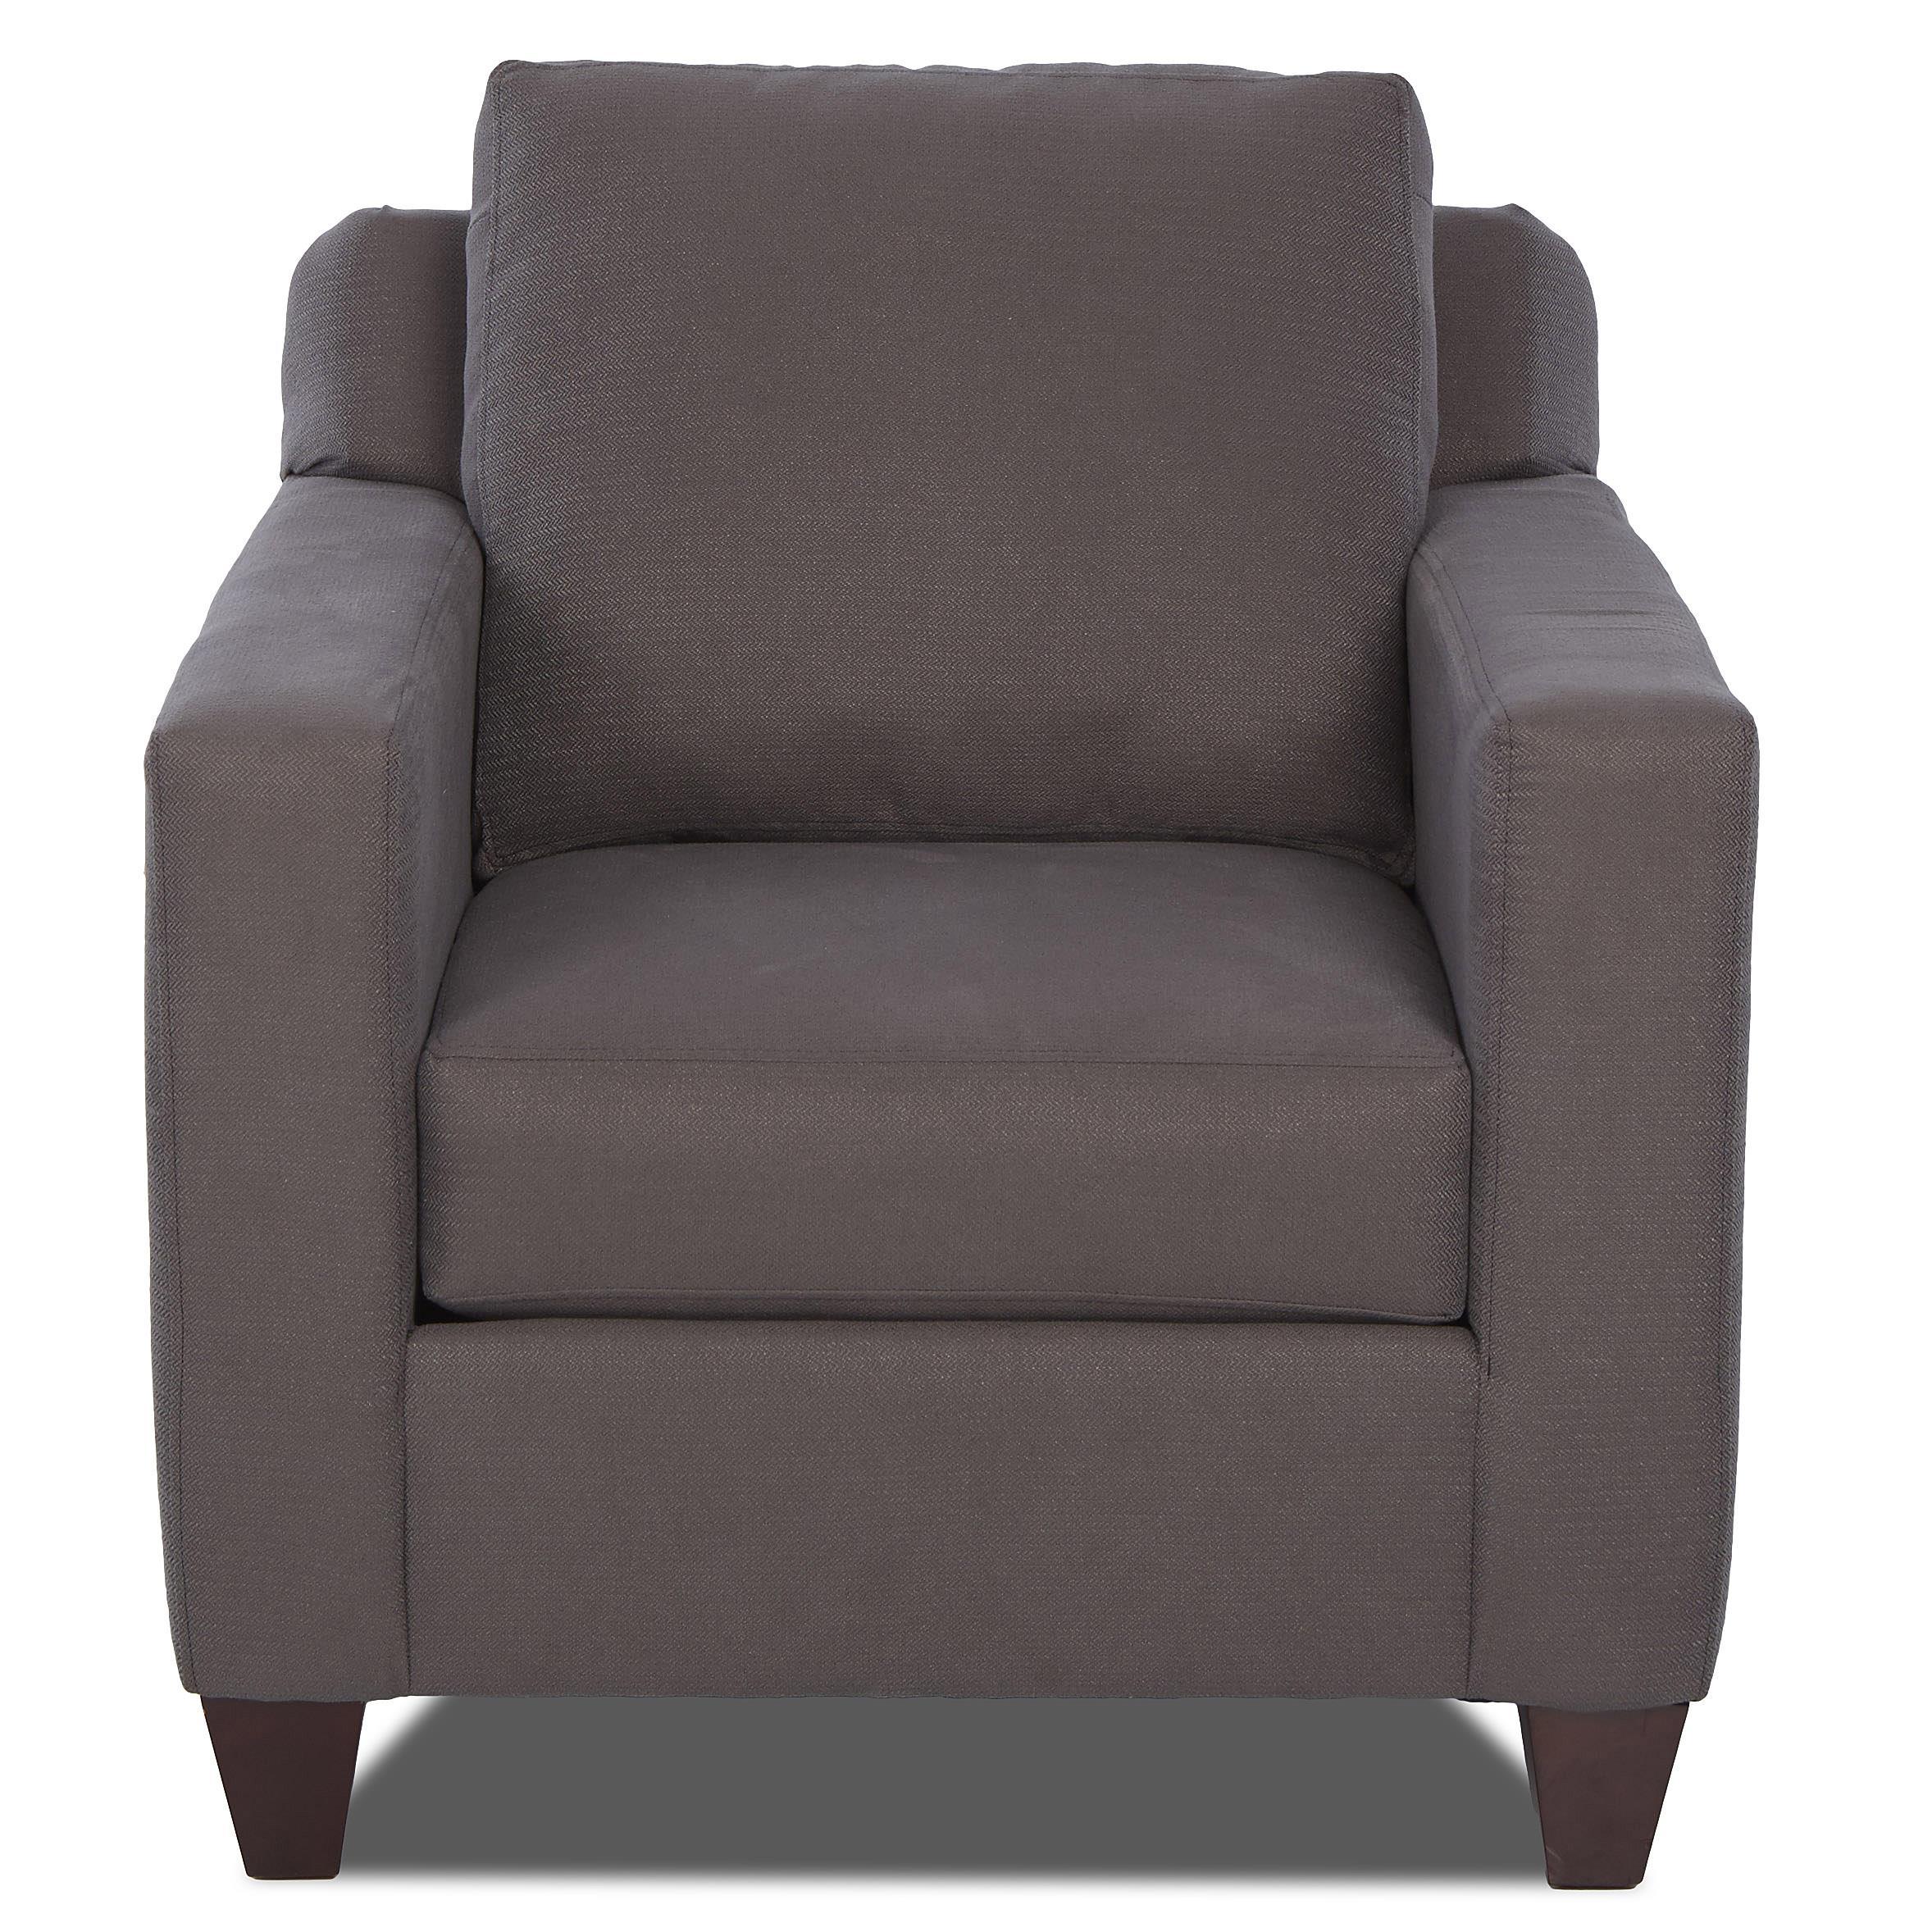 Klaussner Bosco Chair - Item Number: K51600 C-MacySmoke